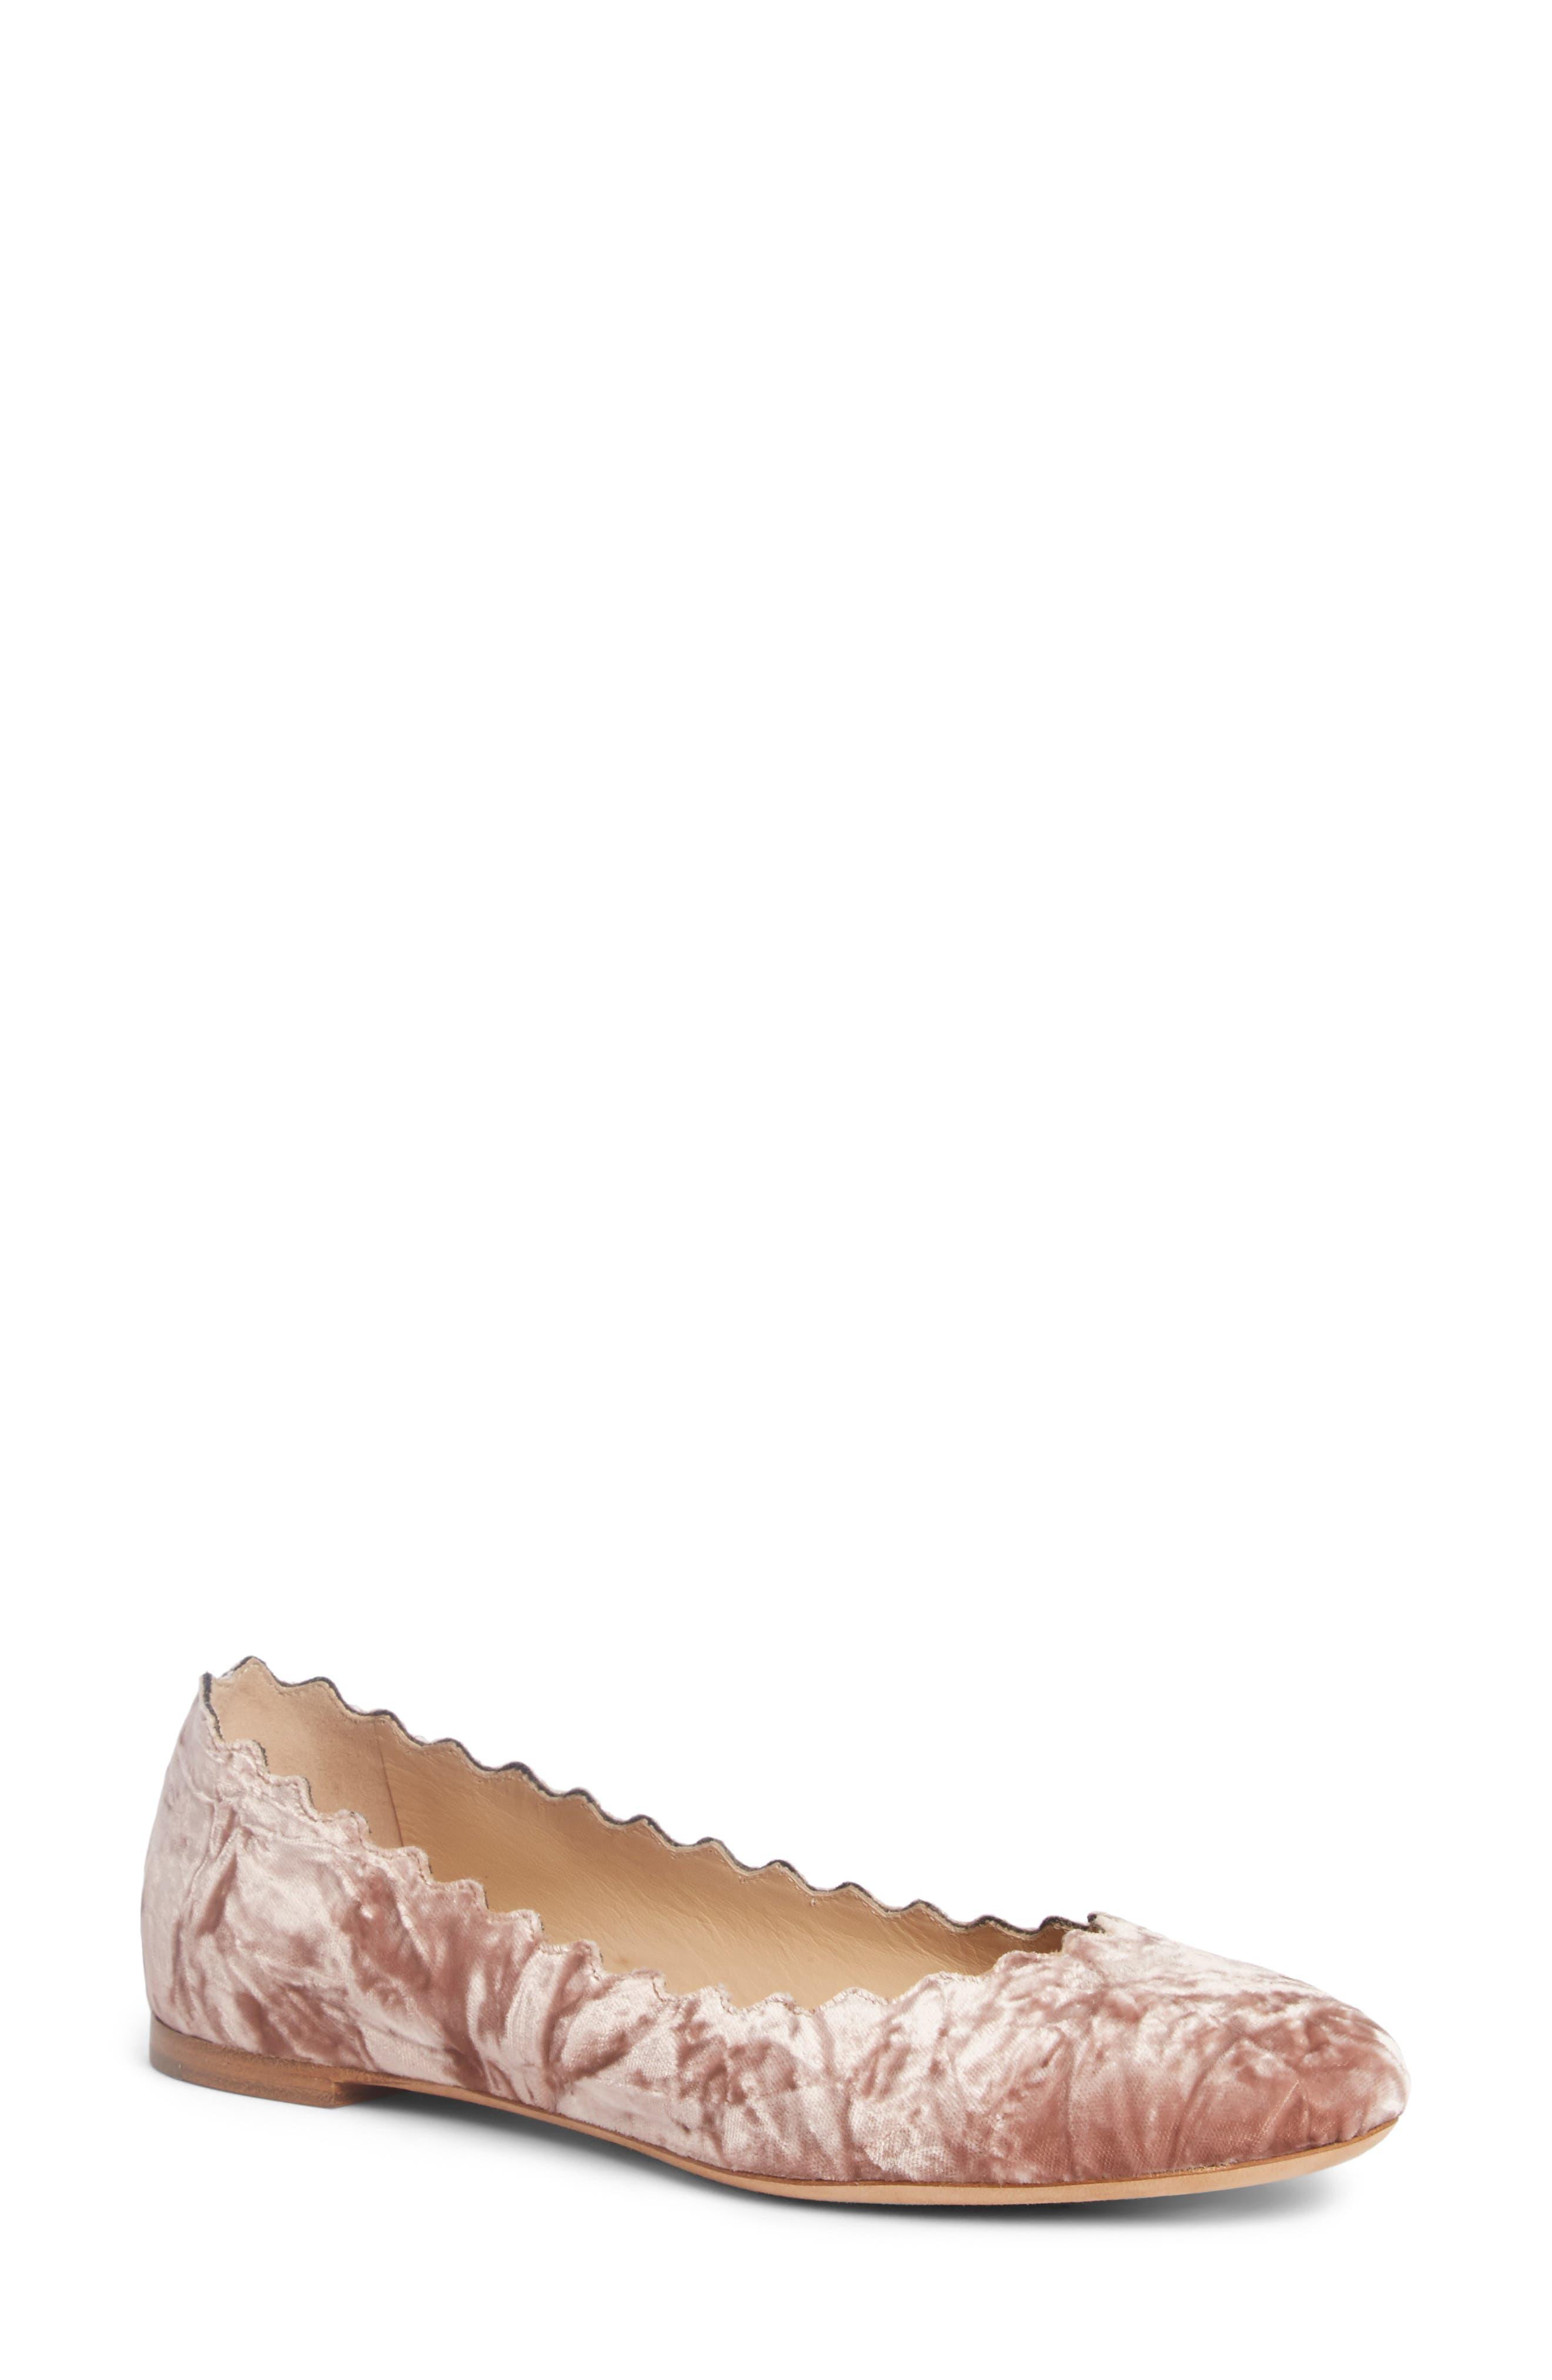 Lauren Scalloped Ballet Flat,                         Main,                         color, 280